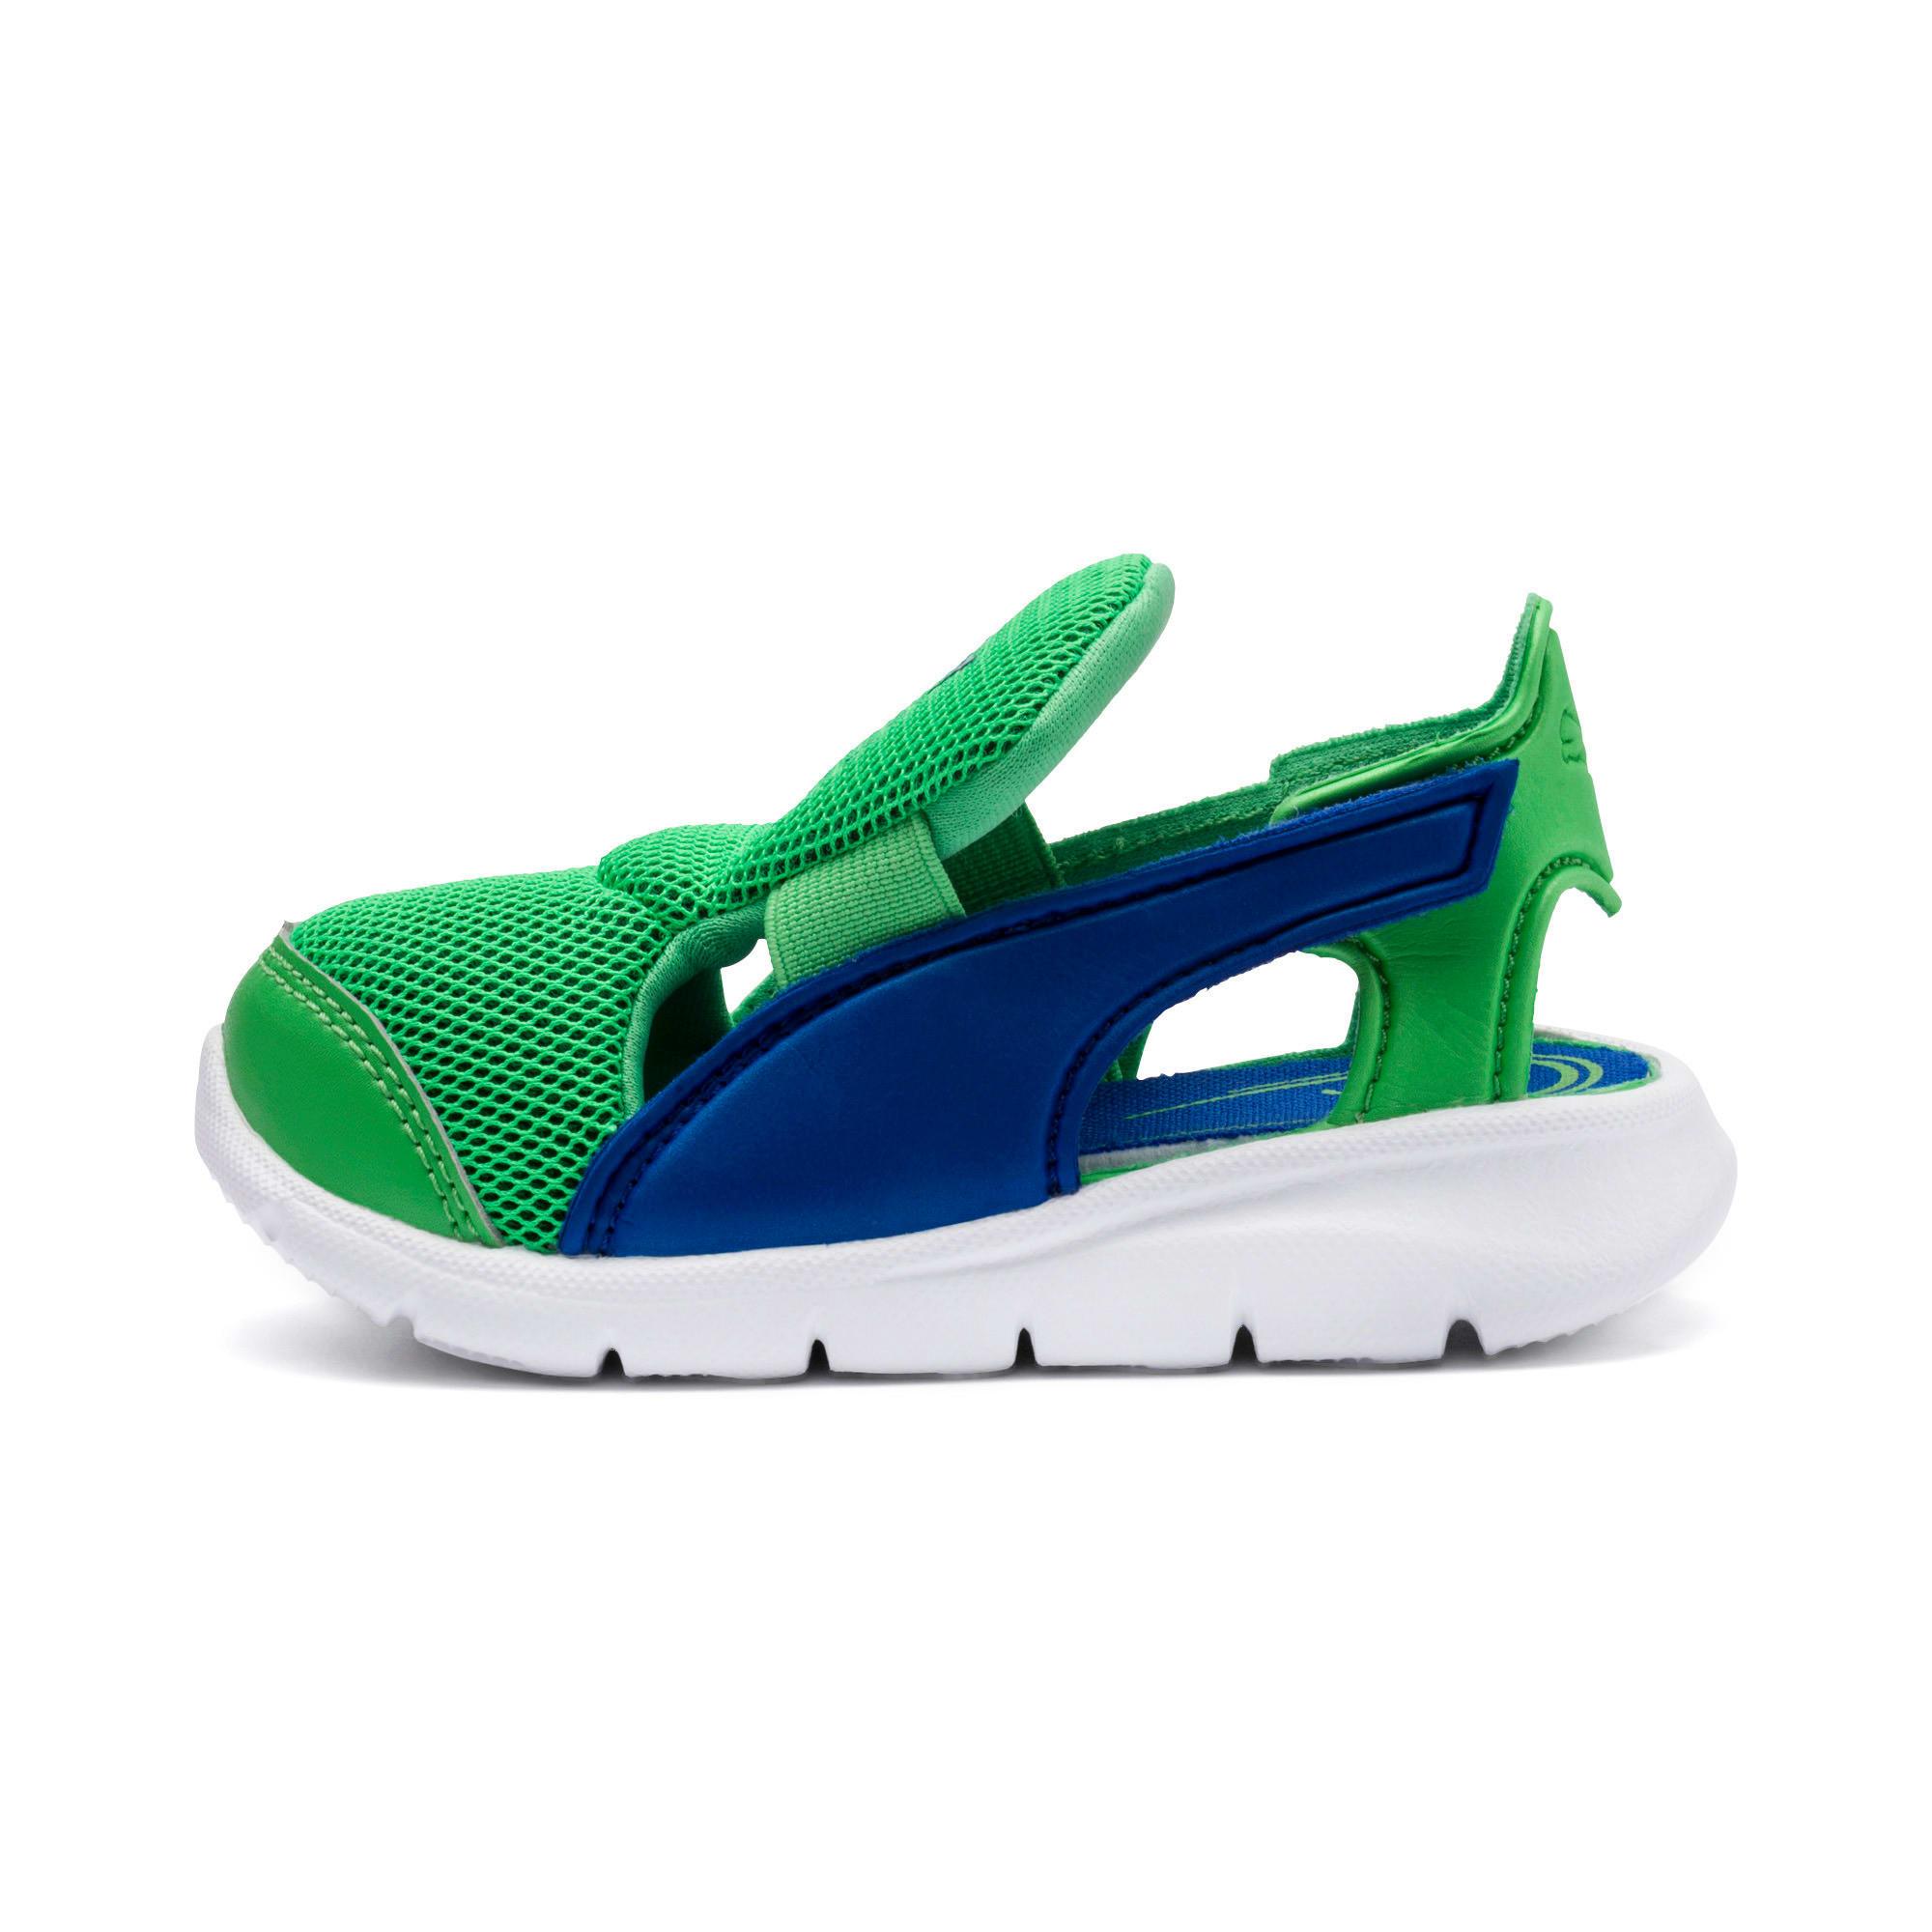 Thumbnail 1 of PUMA Bao 3 Open Toddler Shoes, Surf The Web-Irish Green, medium